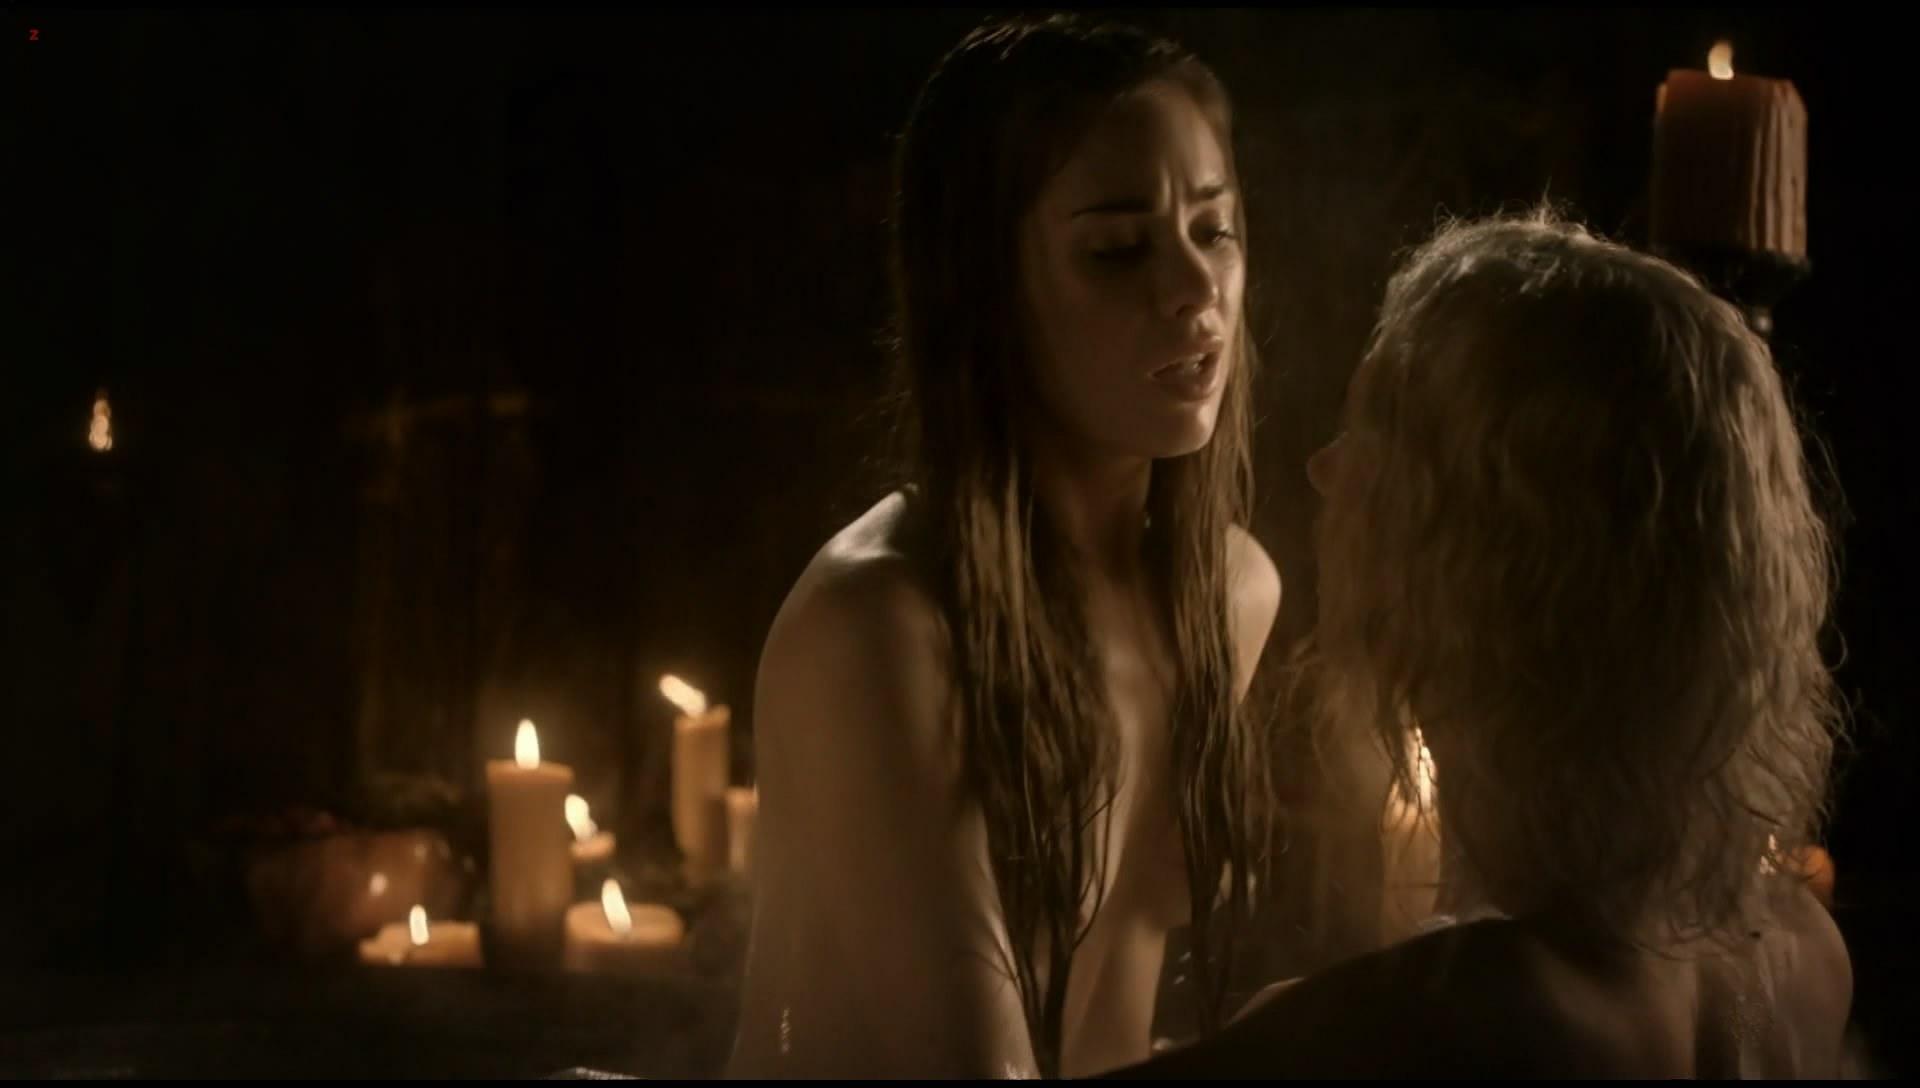 0313180655068_0_Roxanne-McKee-nude-topless-in-Game-of-Thrones-S01E04-hd1080p.jpg